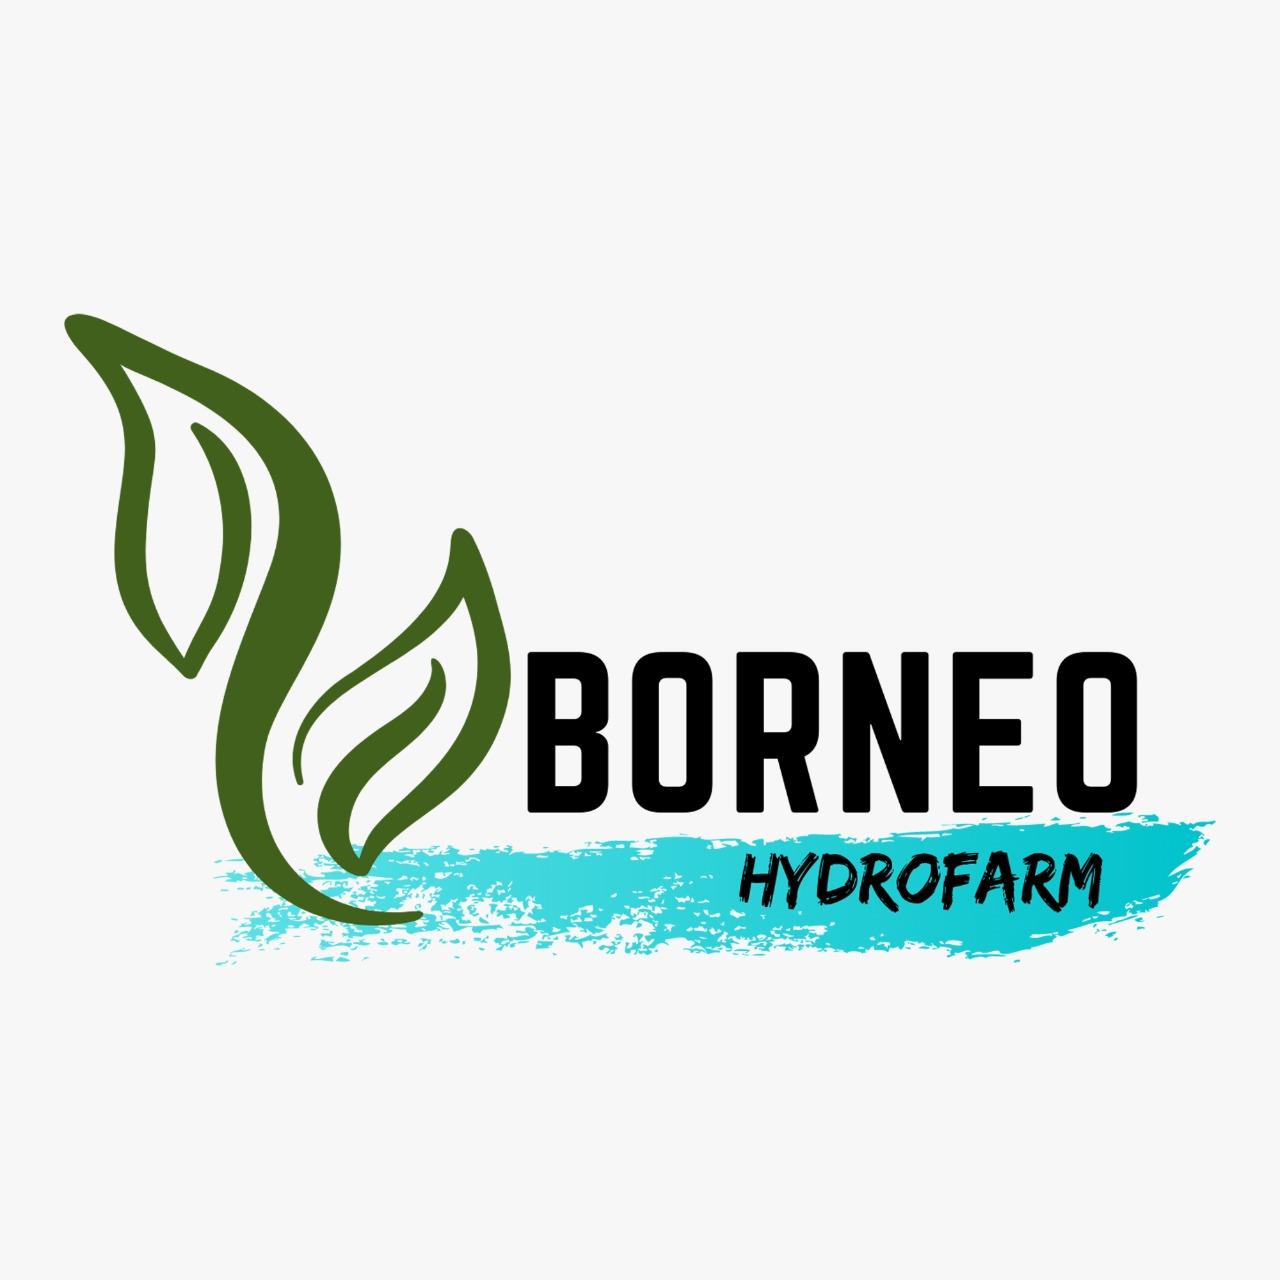 Borneo Hydrofarm